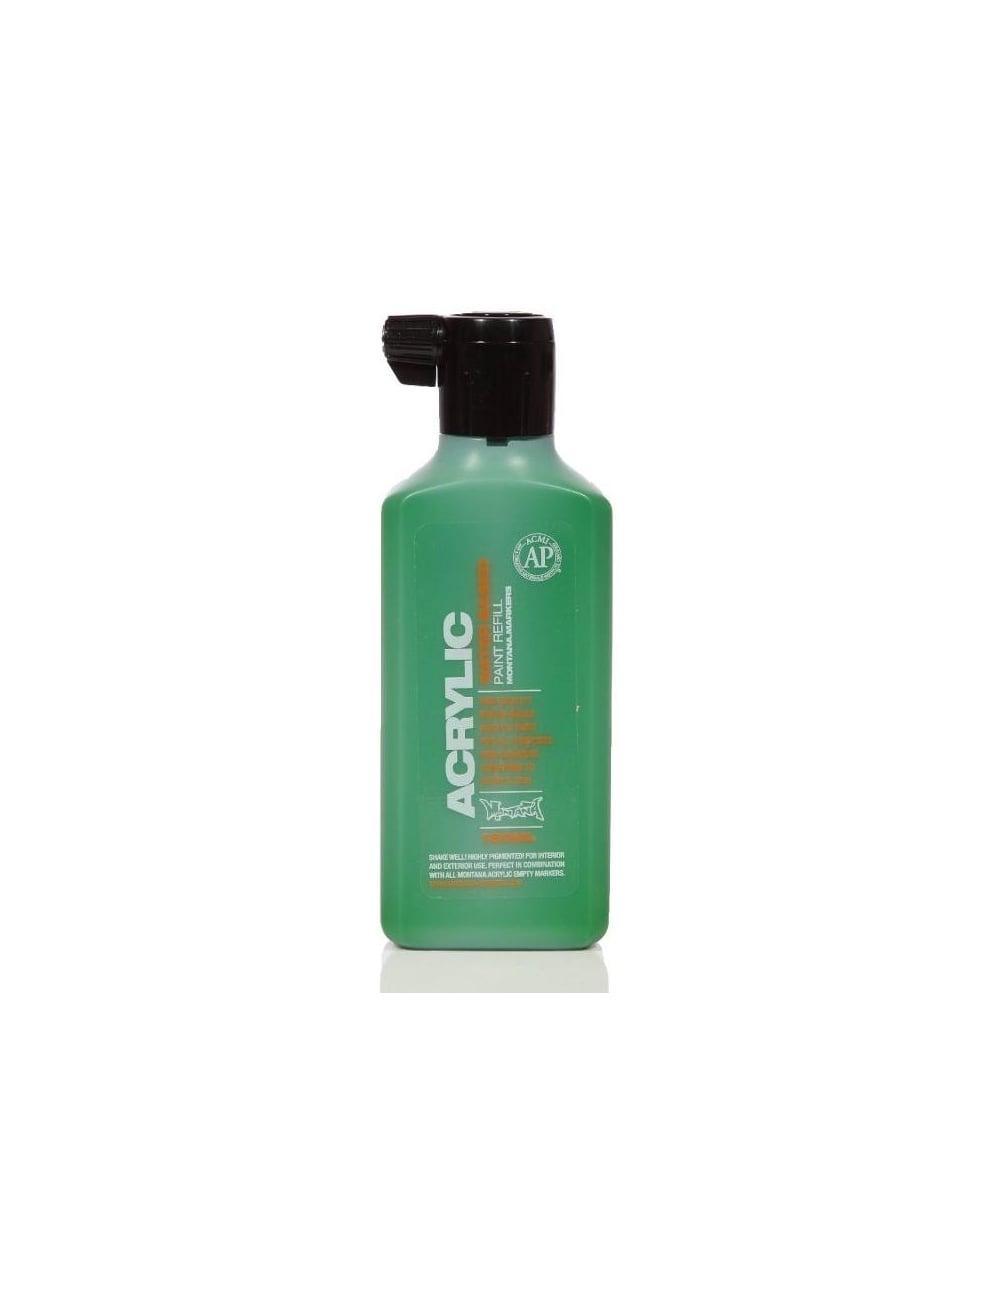 S6020 Shock Green Dark - 180ml Paint Refill